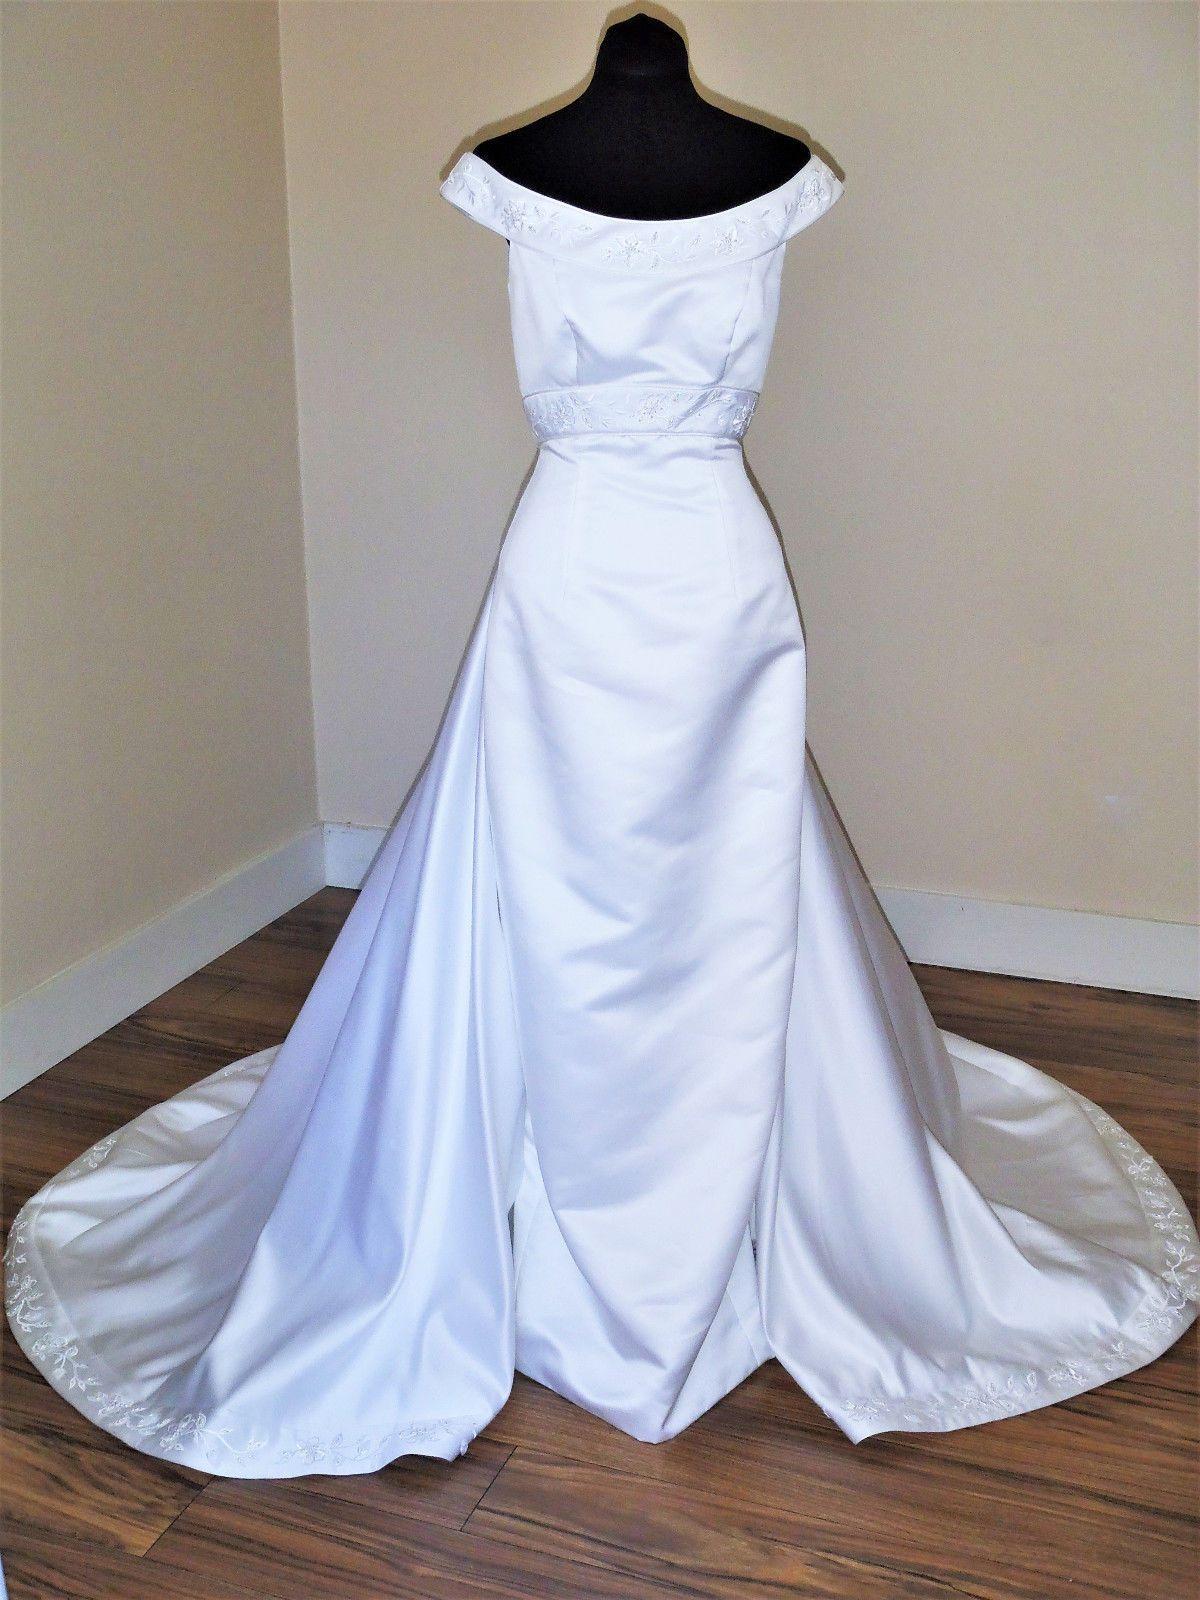 Jasmine white sheath with detachable train wedding dress